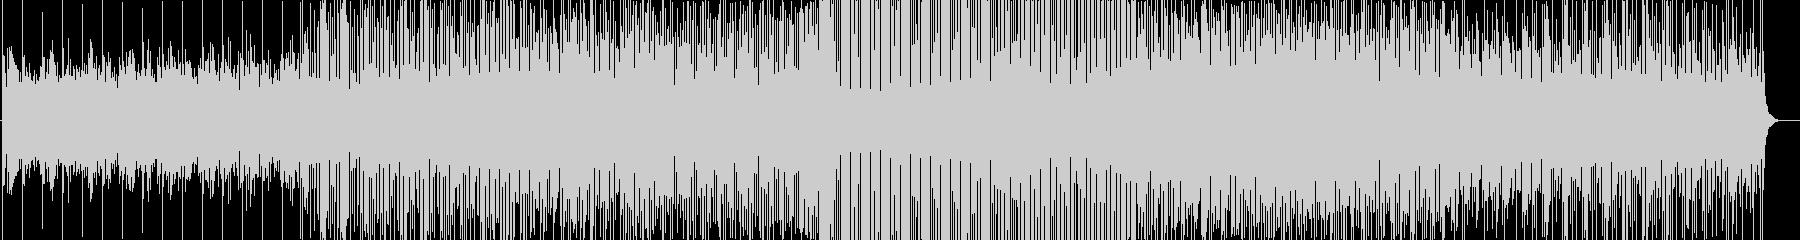 ■PV-IT-浮遊-デジタル-ニュースの未再生の波形